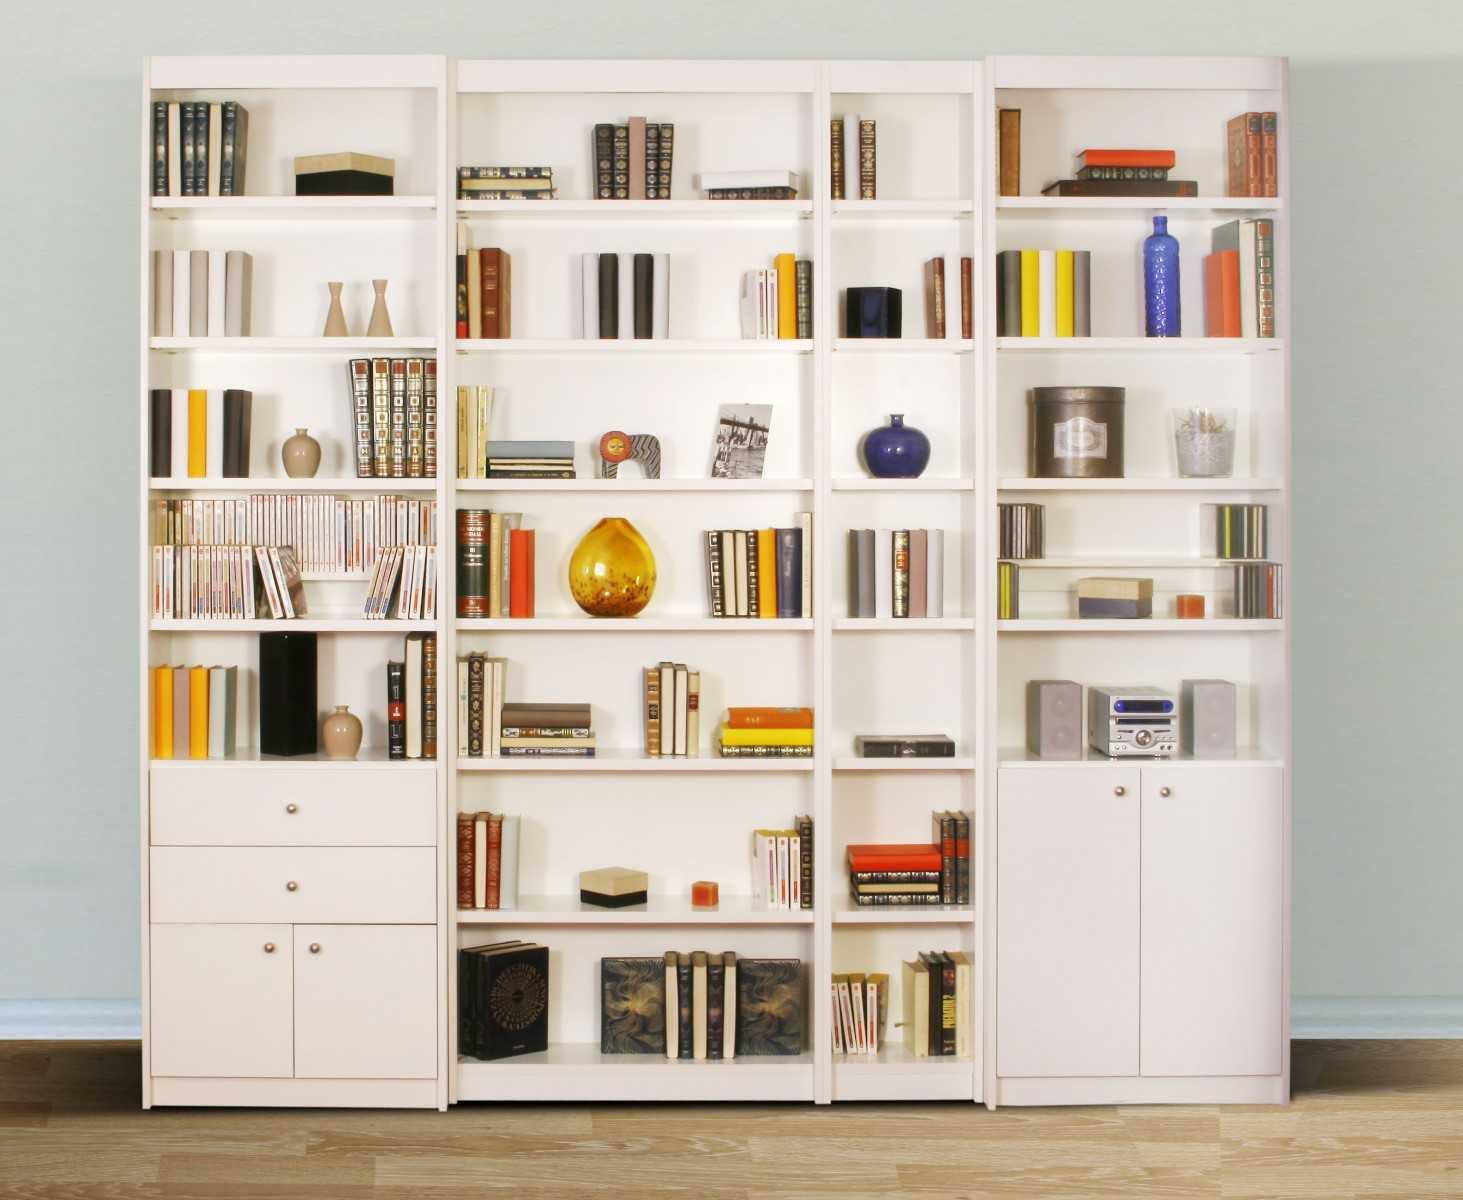 oc ane la maison des bibliotheques. Black Bedroom Furniture Sets. Home Design Ideas